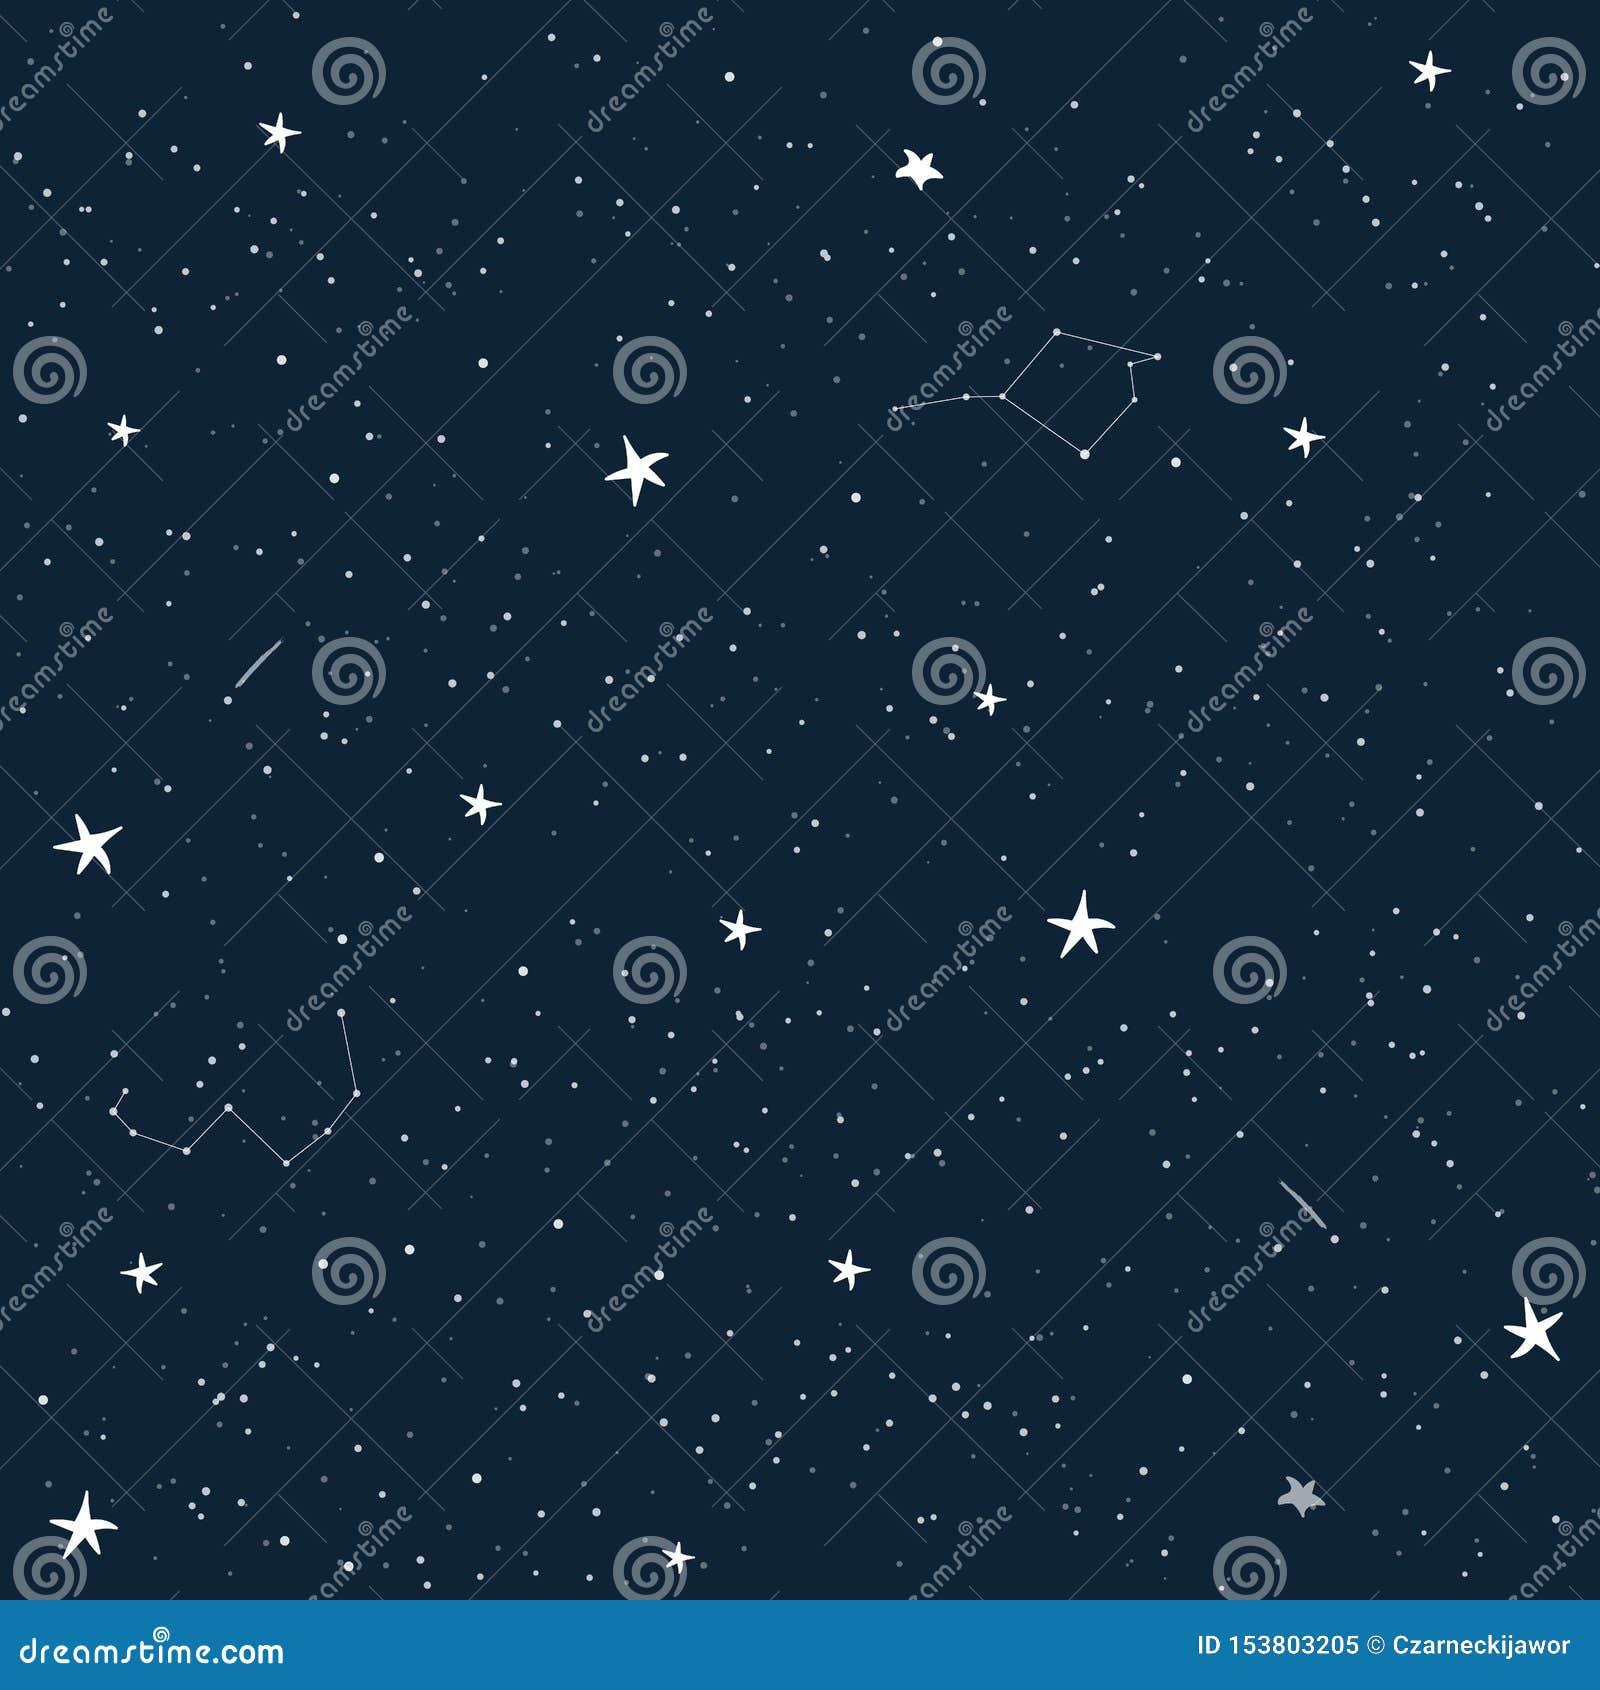 Cartoon Sky With Stars Seamless Vector Pattern Child Wallpaper